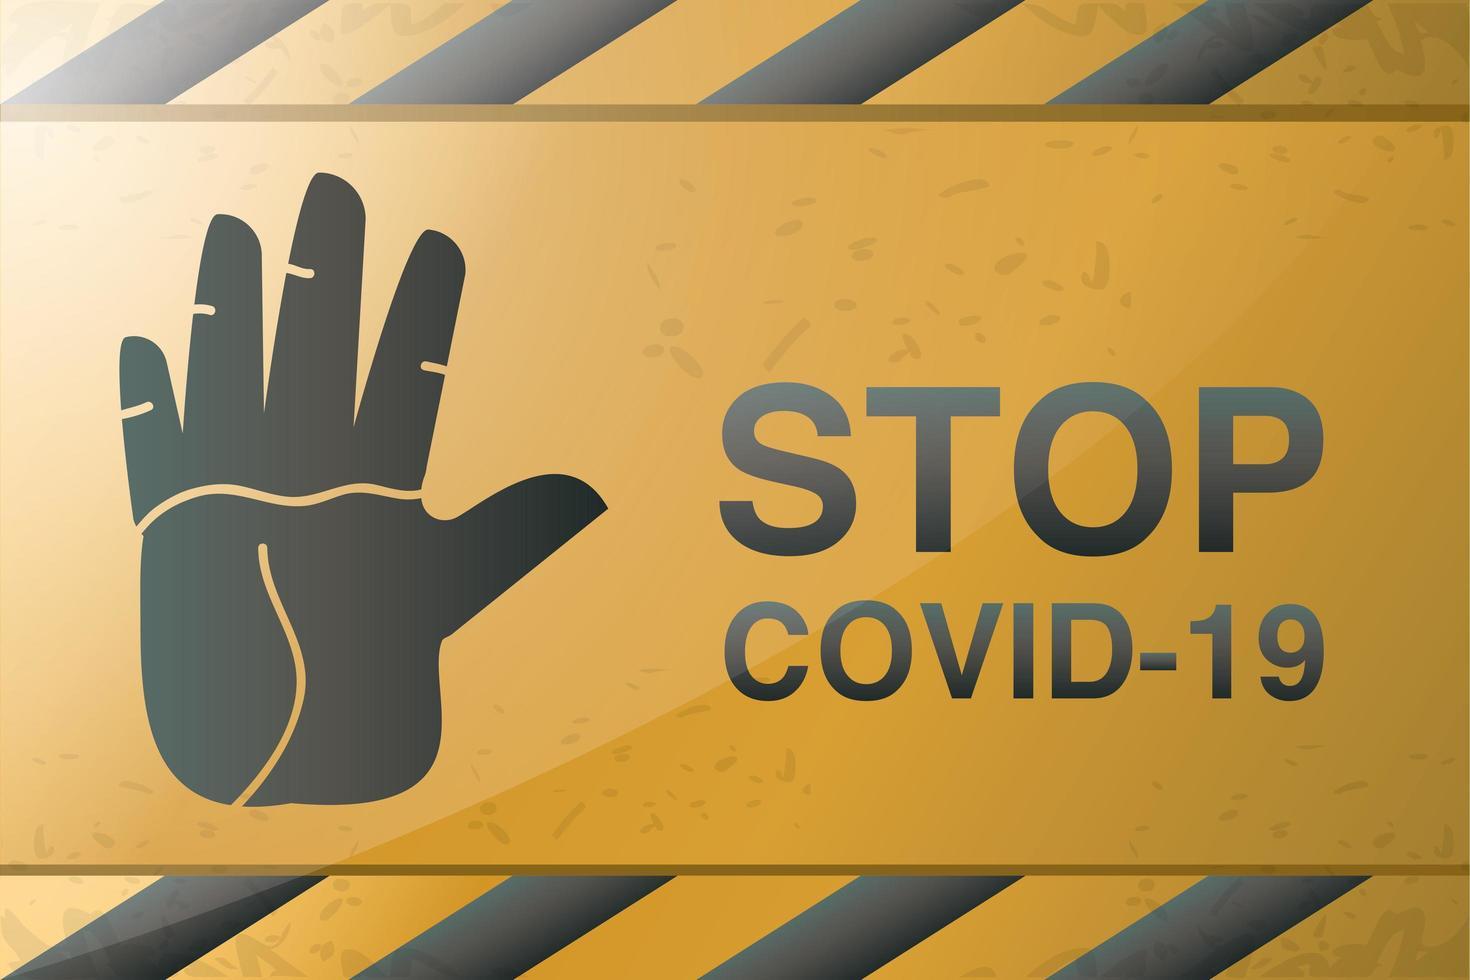 Symbol der Vorsicht, stoppen Sie Covid 19 oder Coronavirus vektor